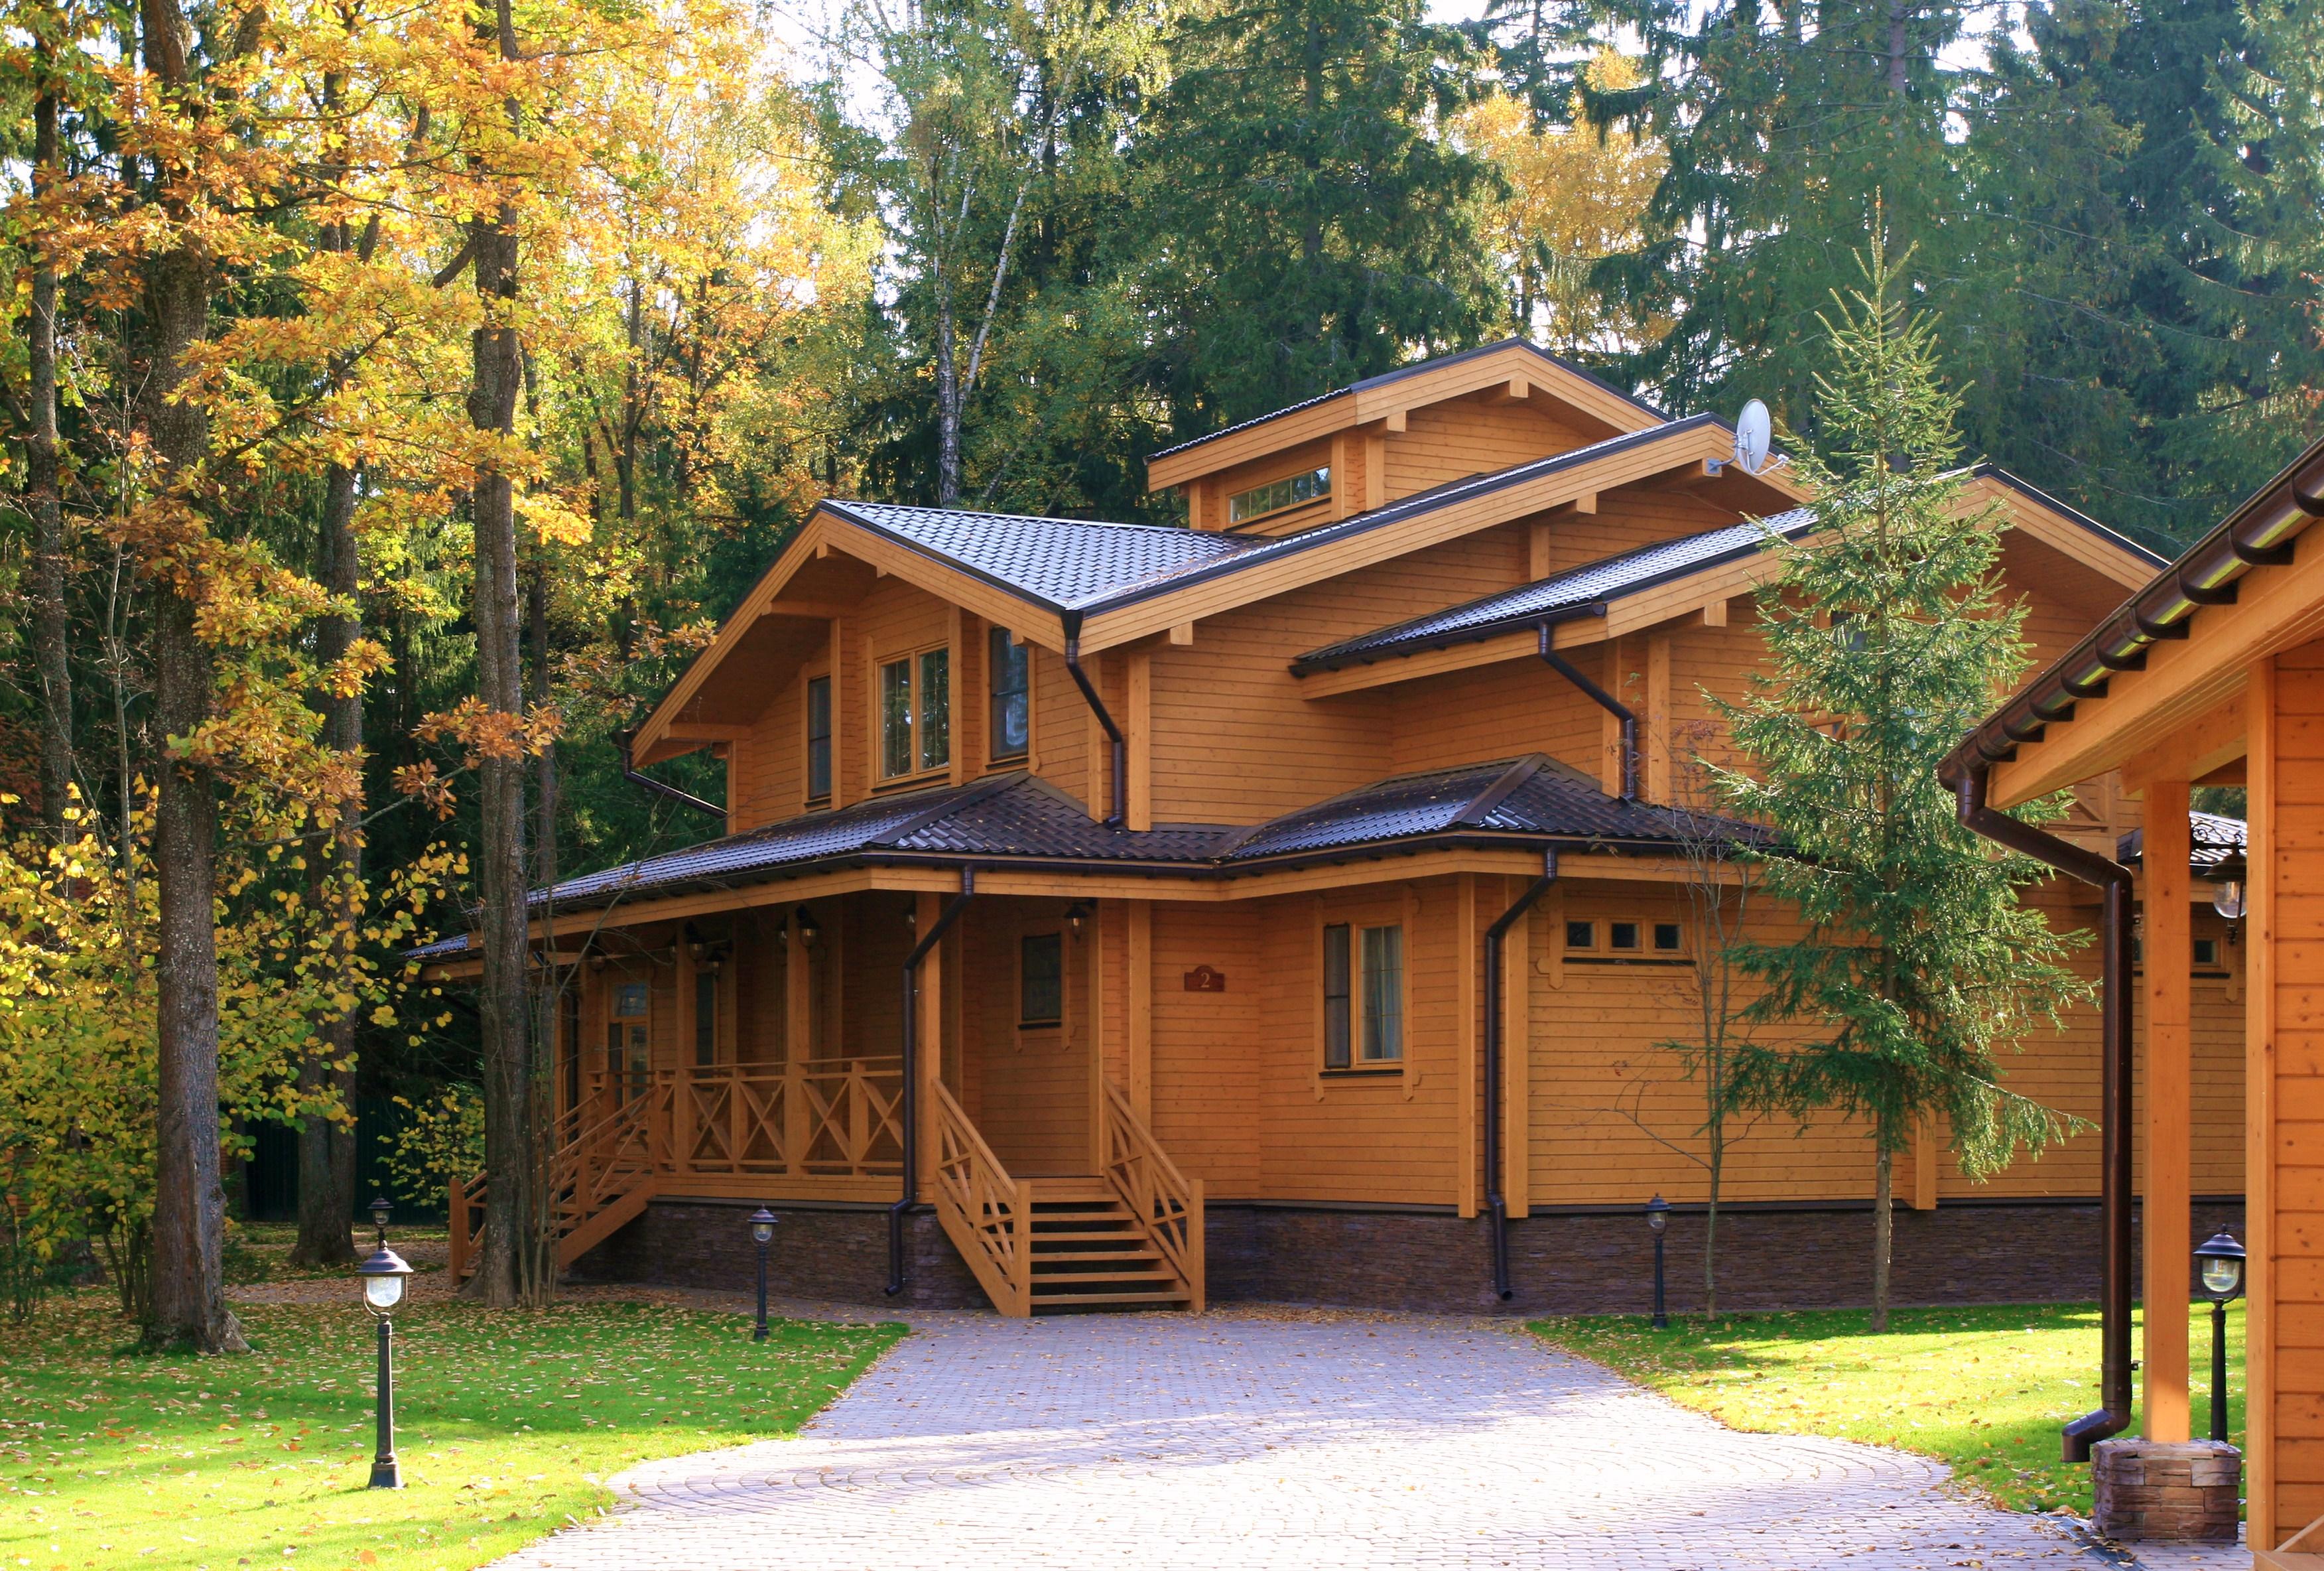 строительство дома и обустройство кухни